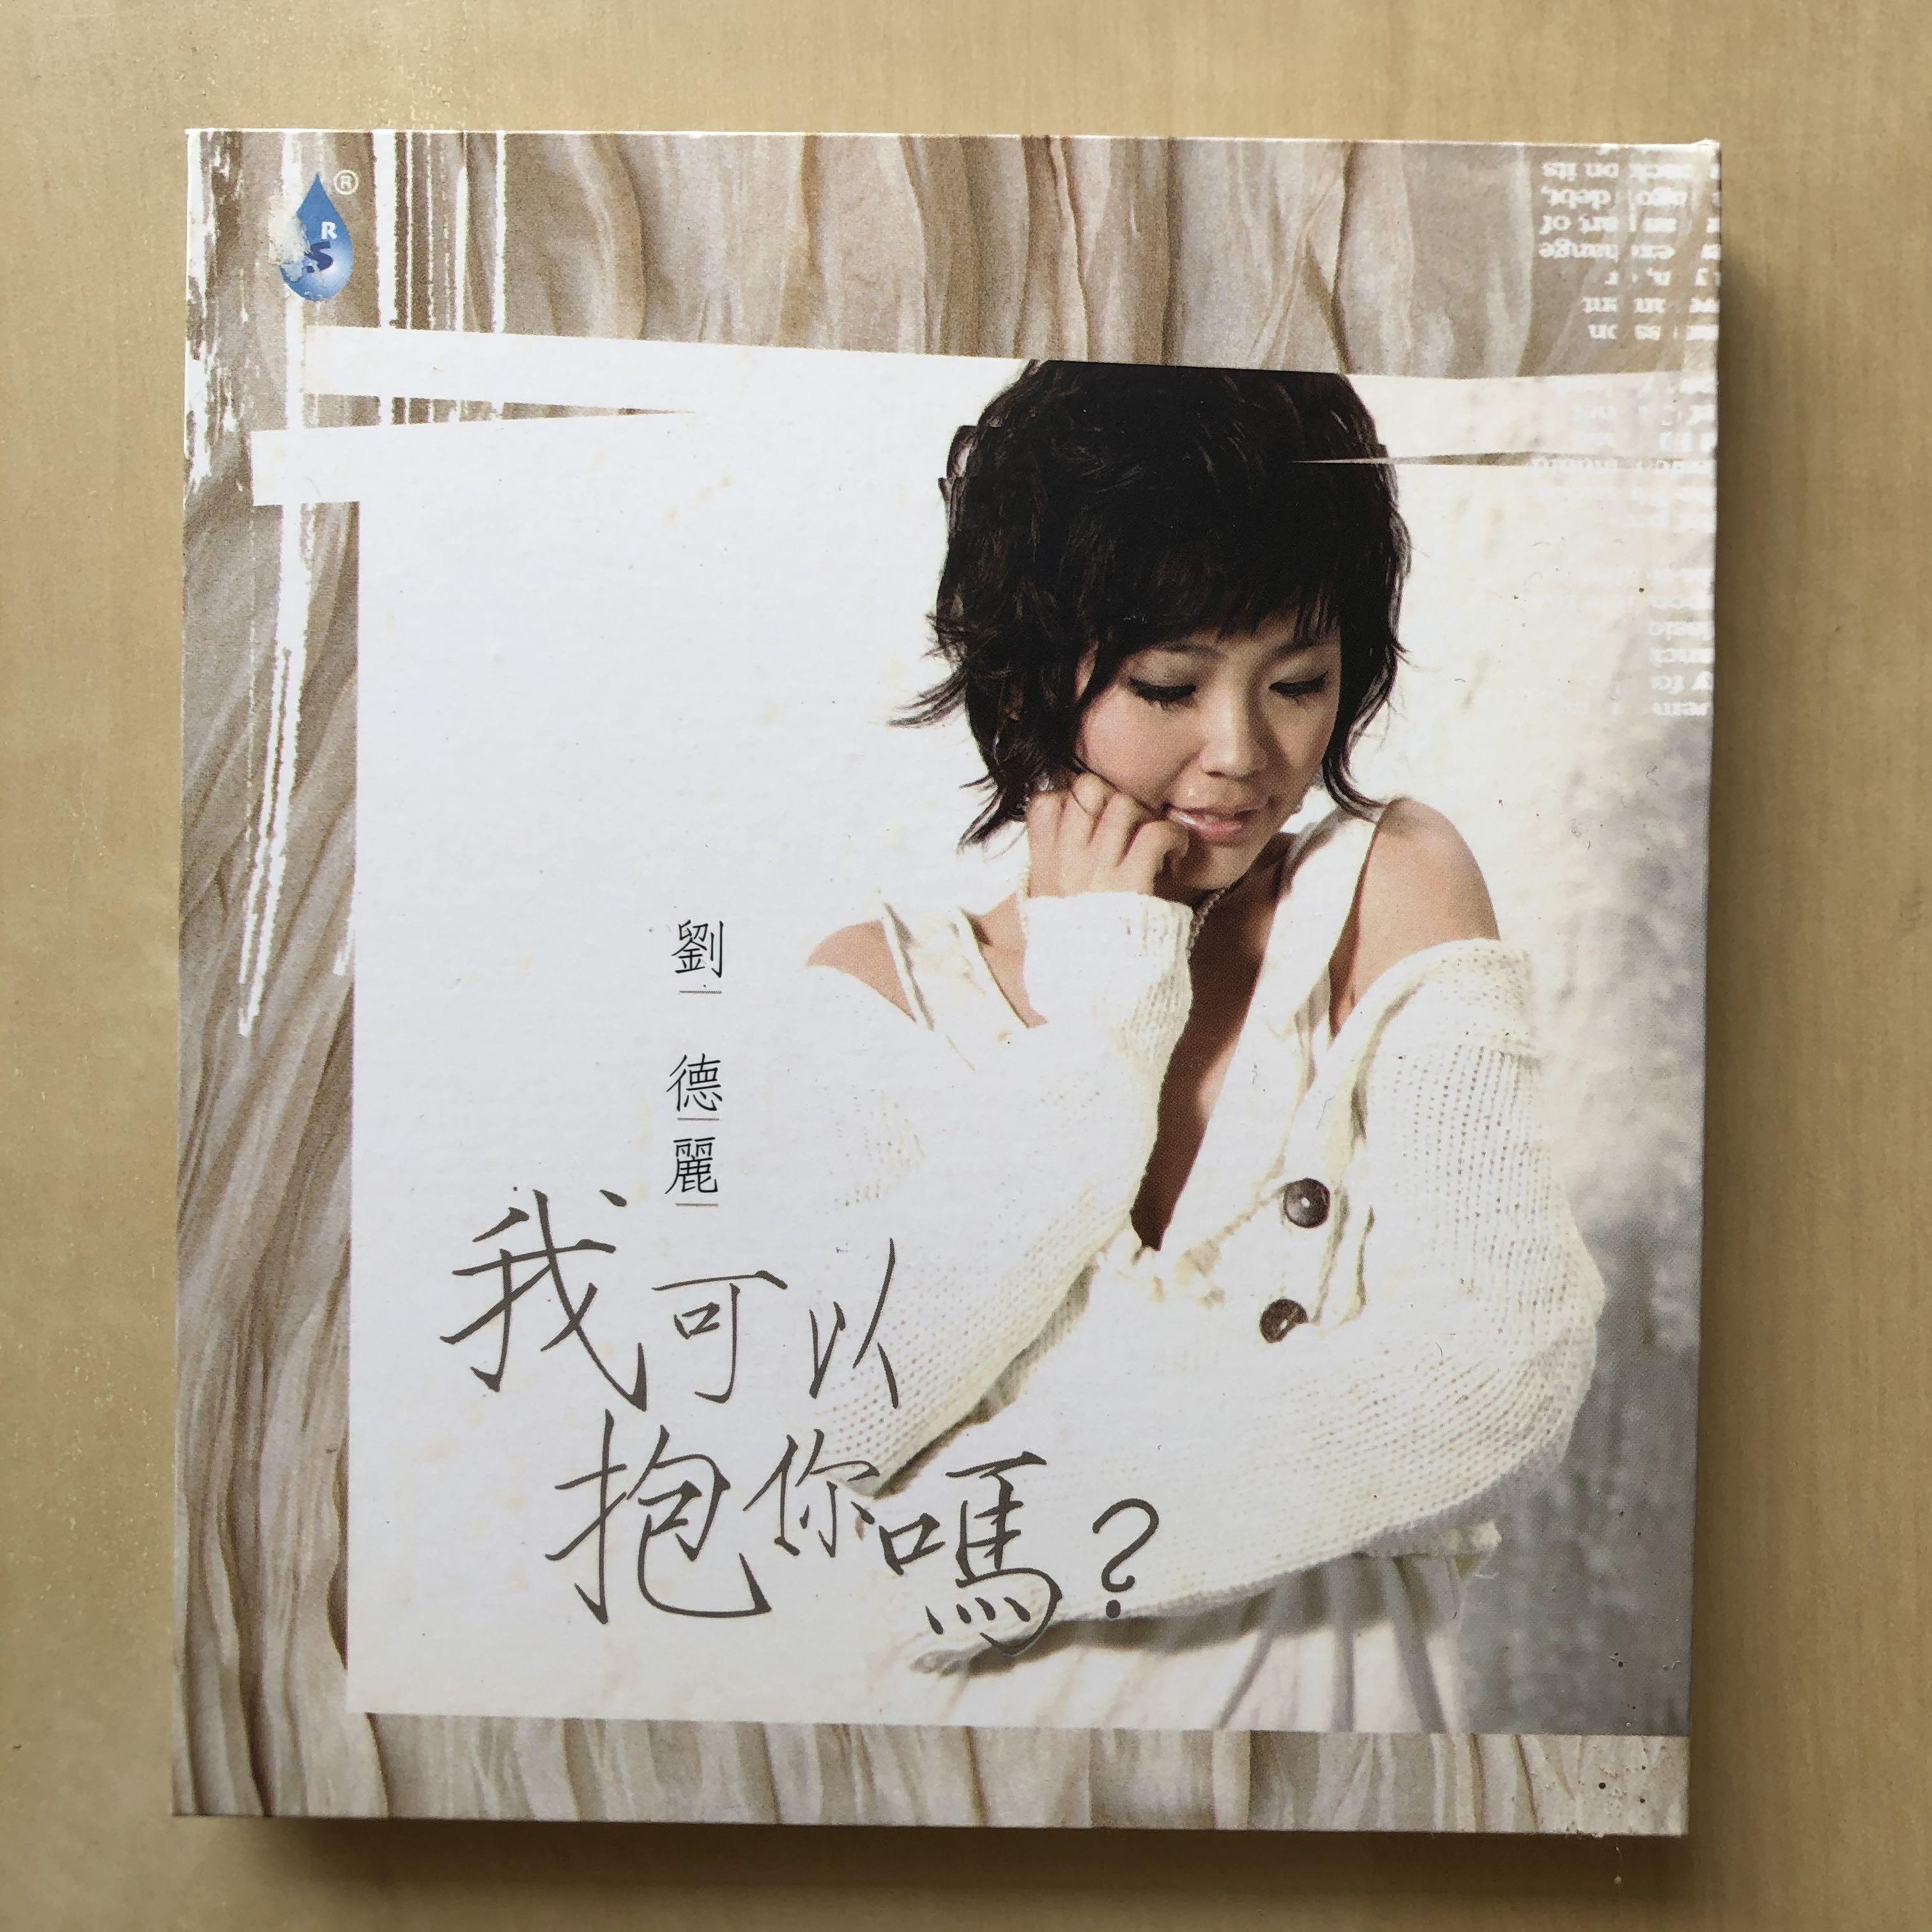 CD丨劉德麗 我可以抱你嗎? 發燒女聲 張惠妹 孫燕姿 王菲 劉若英